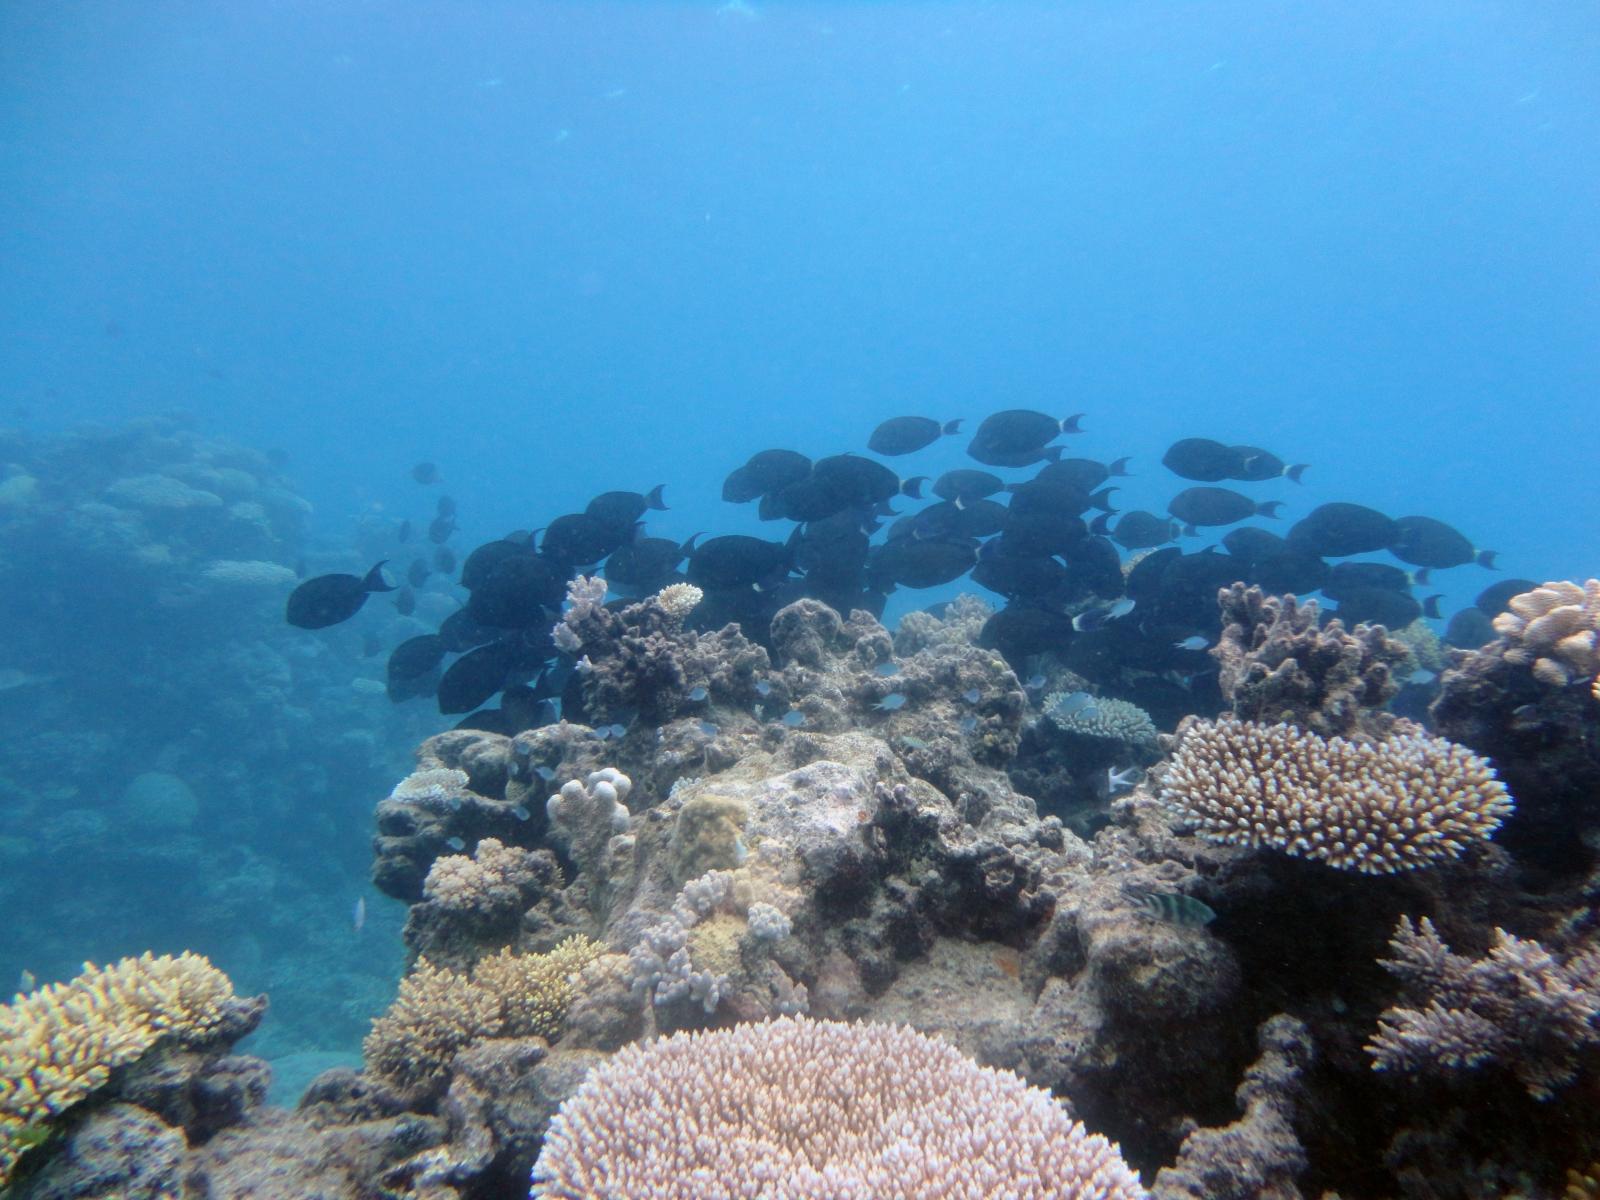 Acanthurus_gahhm_002_C_Peces-Cirujano_L_Gran-Barrera-de-Coral_U_Sebas_03112013